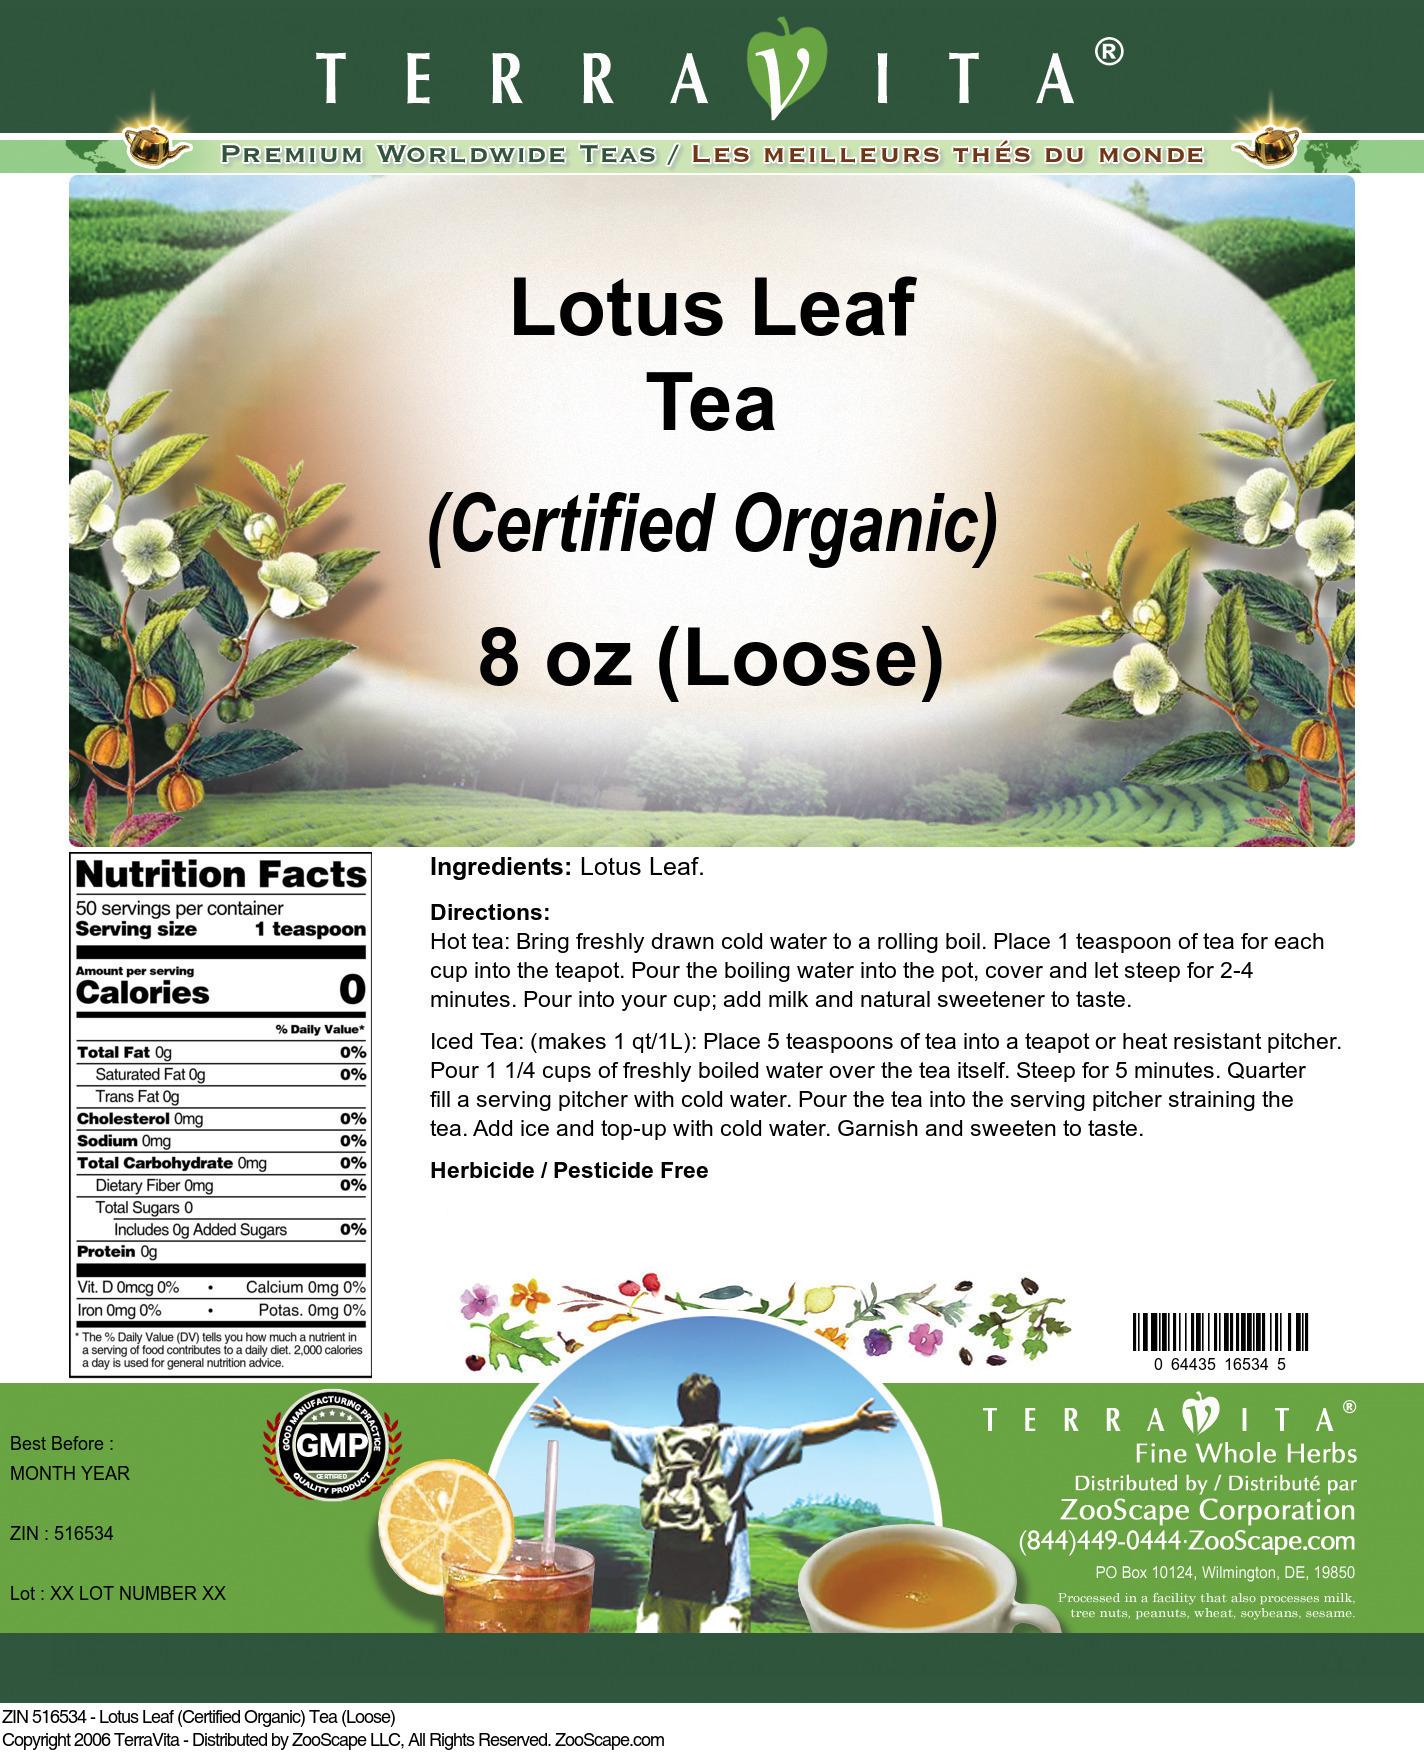 Lotus Leaf (Certified Organic) Tea (Loose)